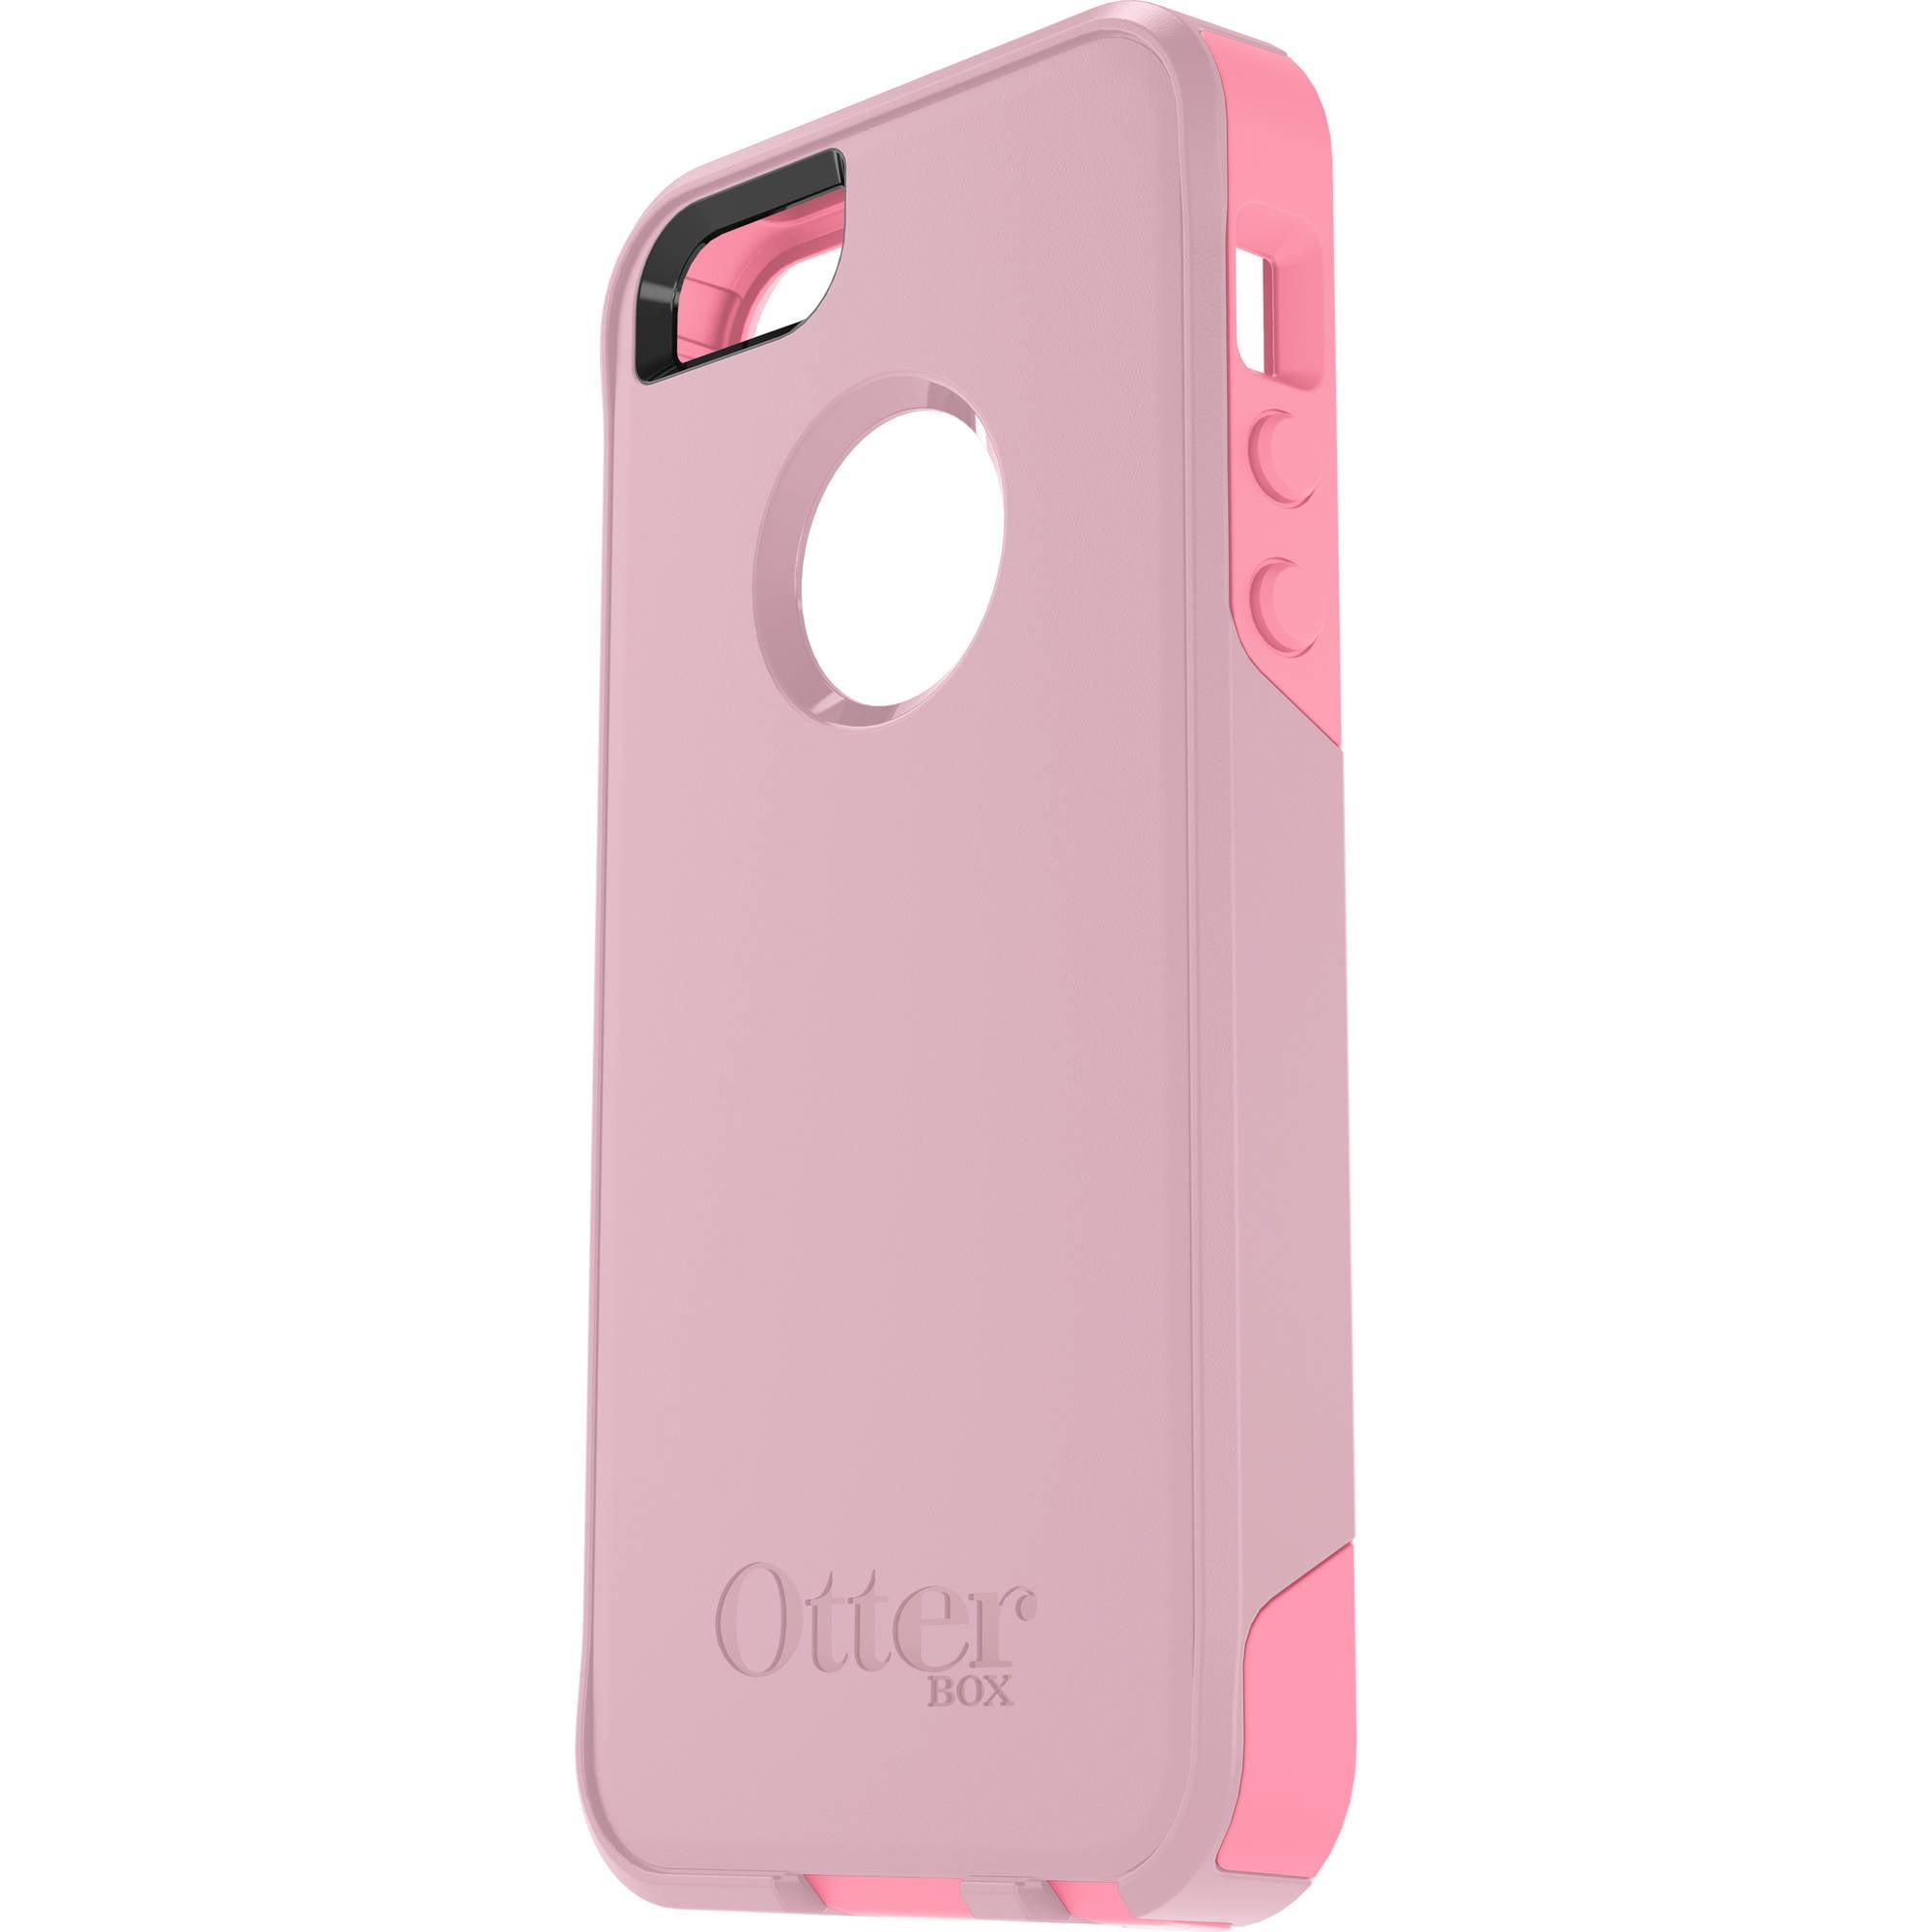 OtterBox Commuter Series Case for Apple iPhone 5/5S/SE - Walmart.com